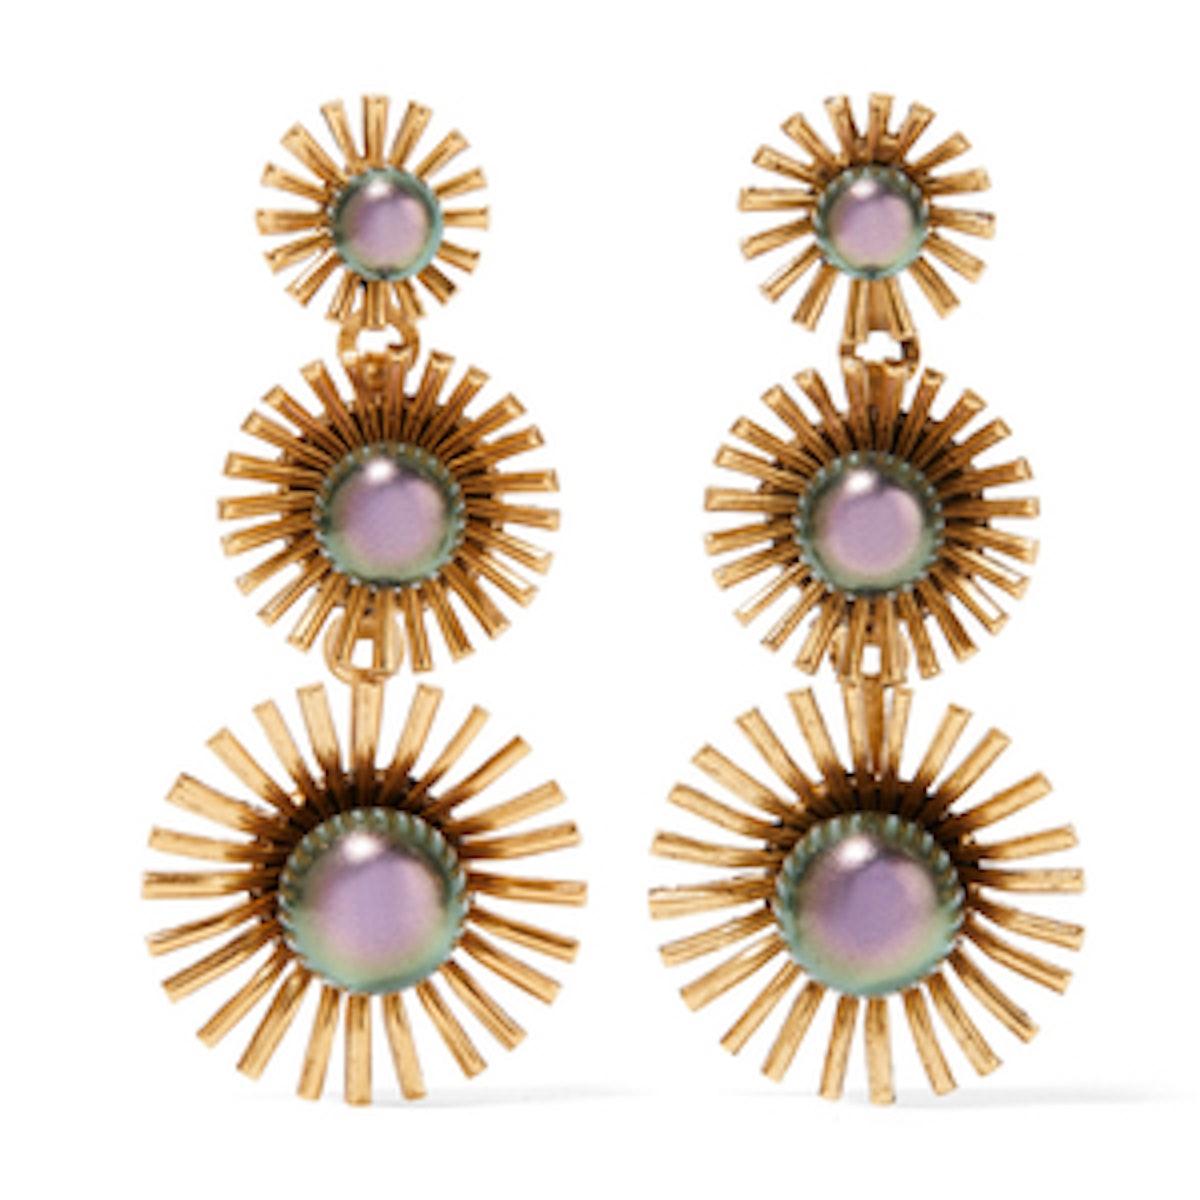 Elizabeth Cole Leonie 24 Karat Gold Plated Swarovski Pearl Earrings